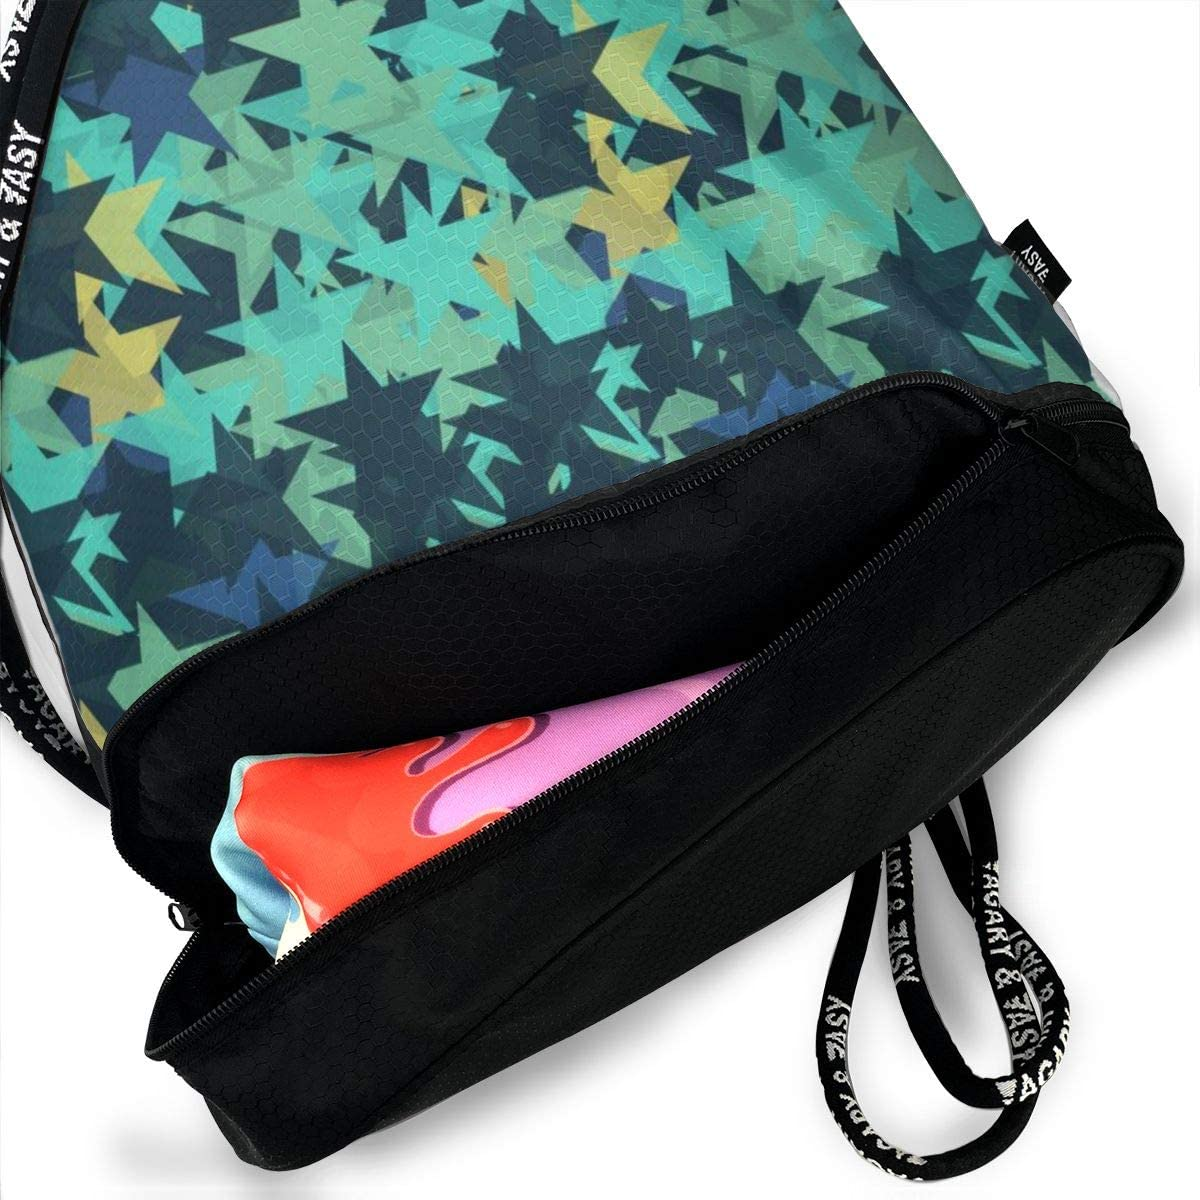 Lightweight Waterproof Large Storage Drawstring Bag For Men /& Women Blue Star Cinch Backpack Sackpack Tote Sack